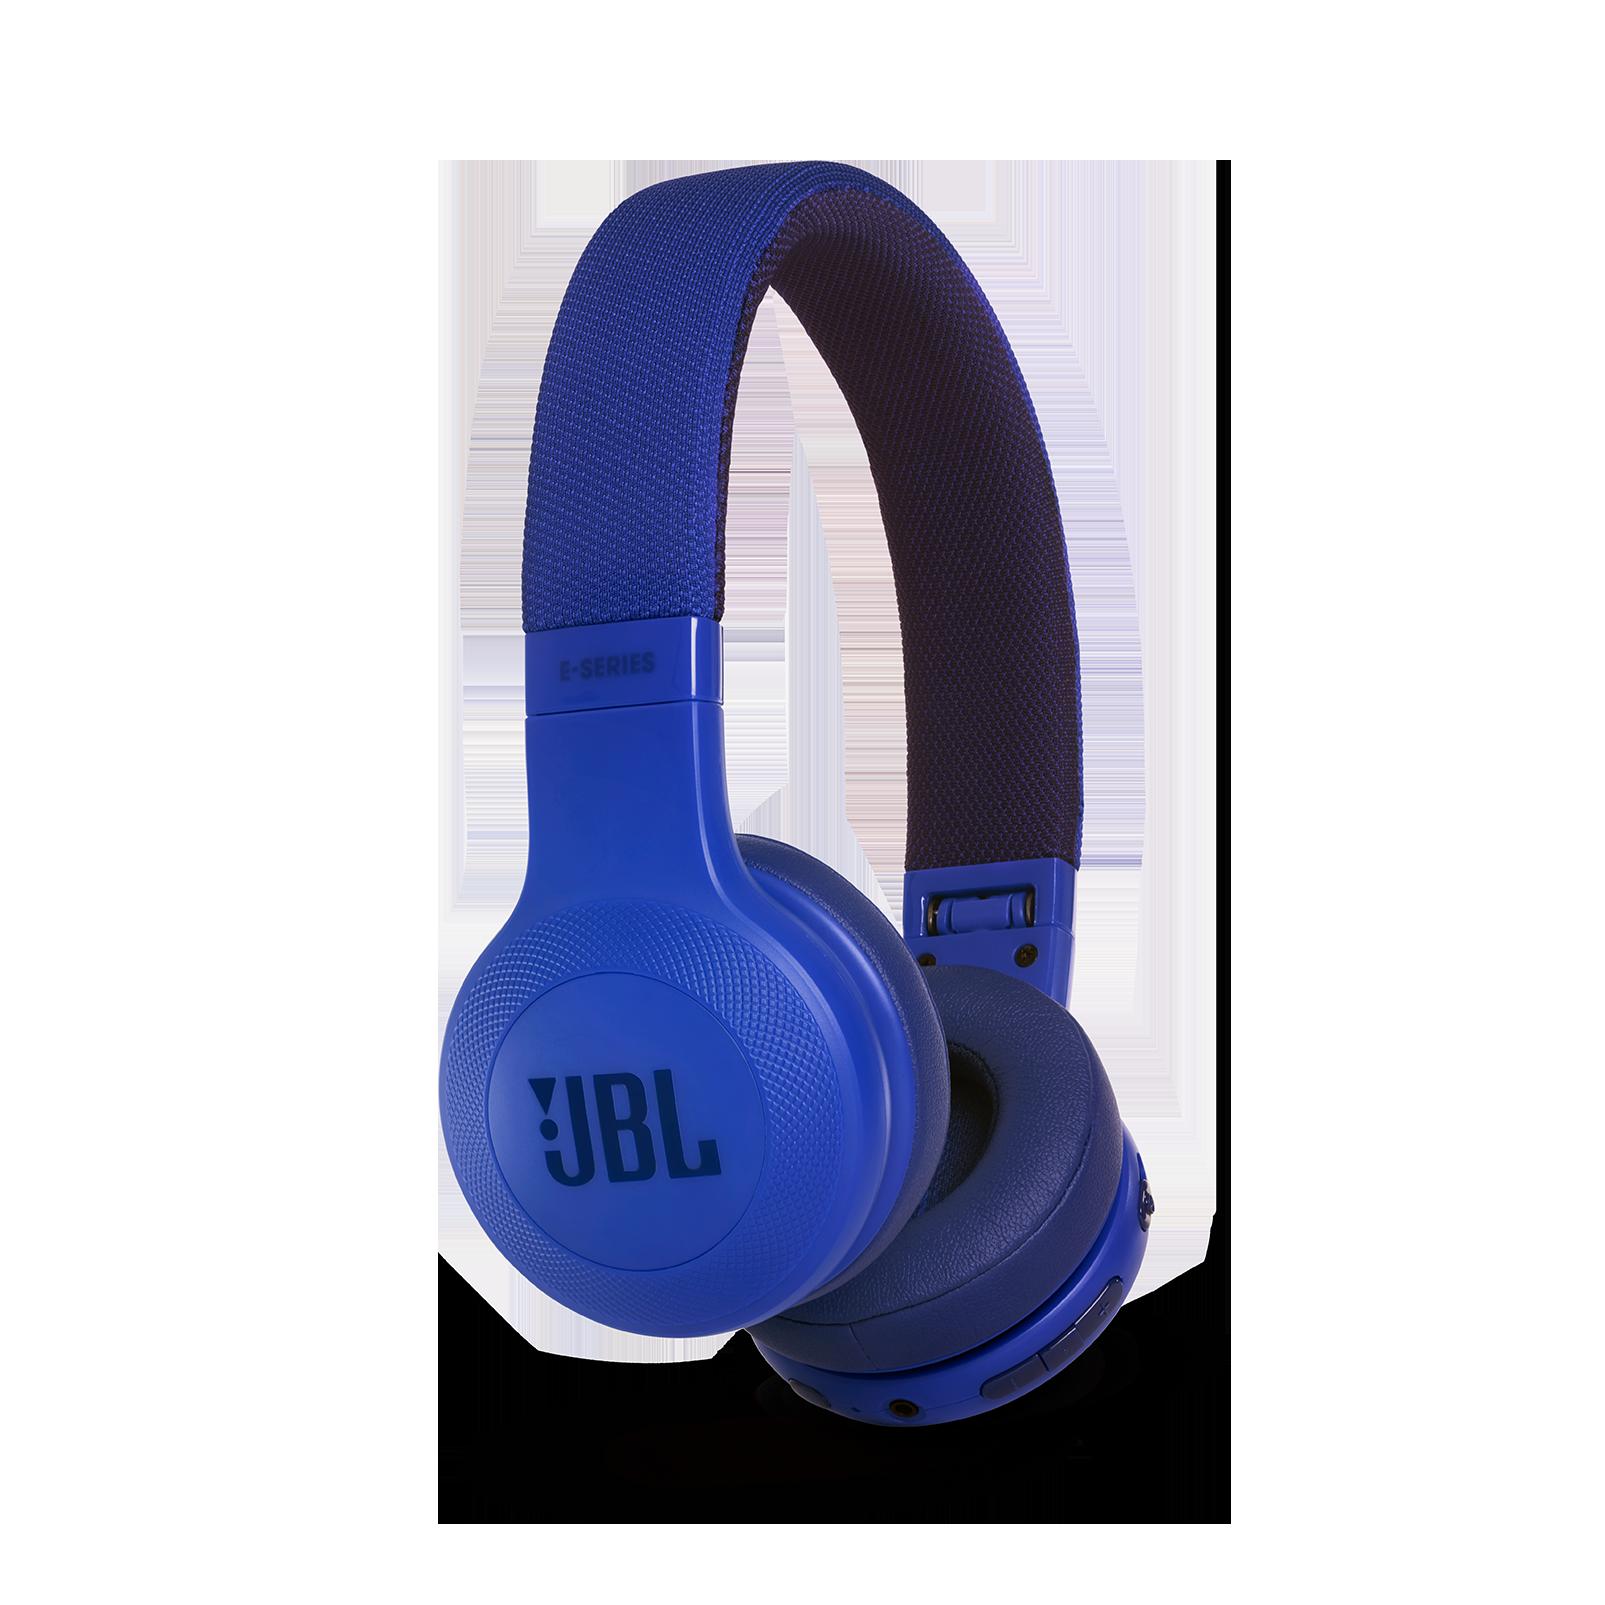 JBL E45BT - Blue - Wireless on-ear headphones - Detailshot 2